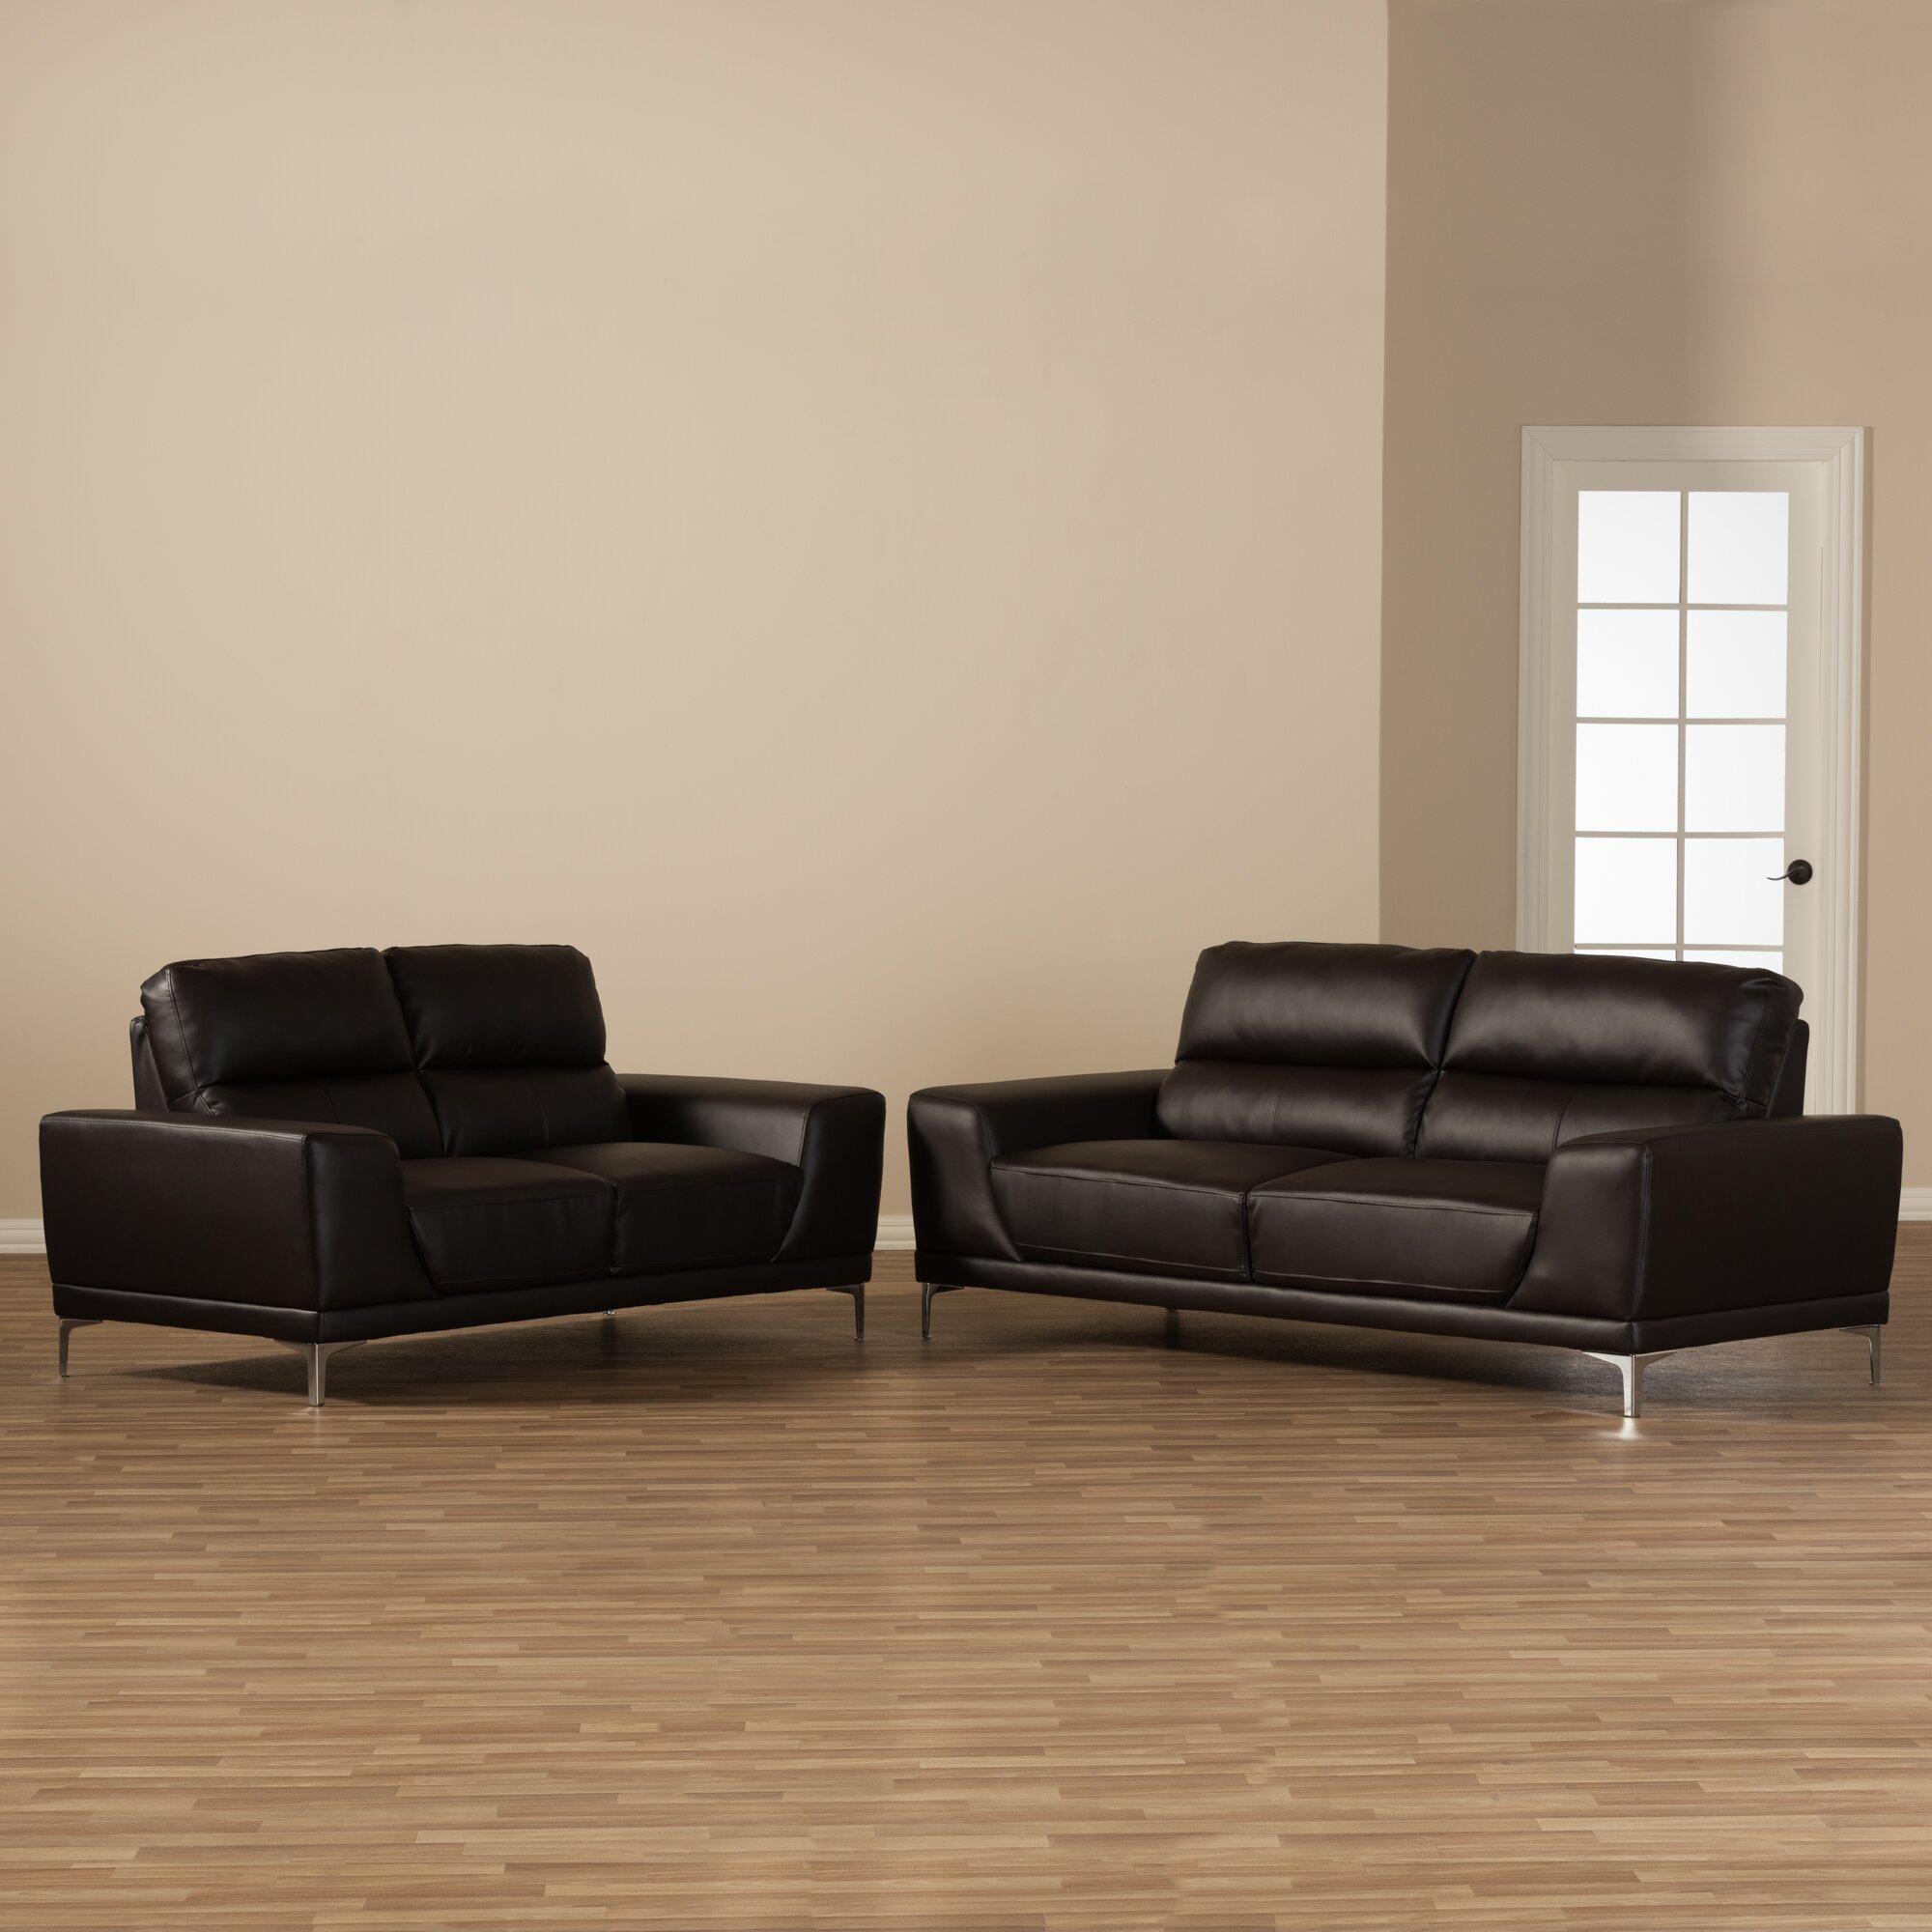 wholesale interiors baxton studio lambton 2 piece living